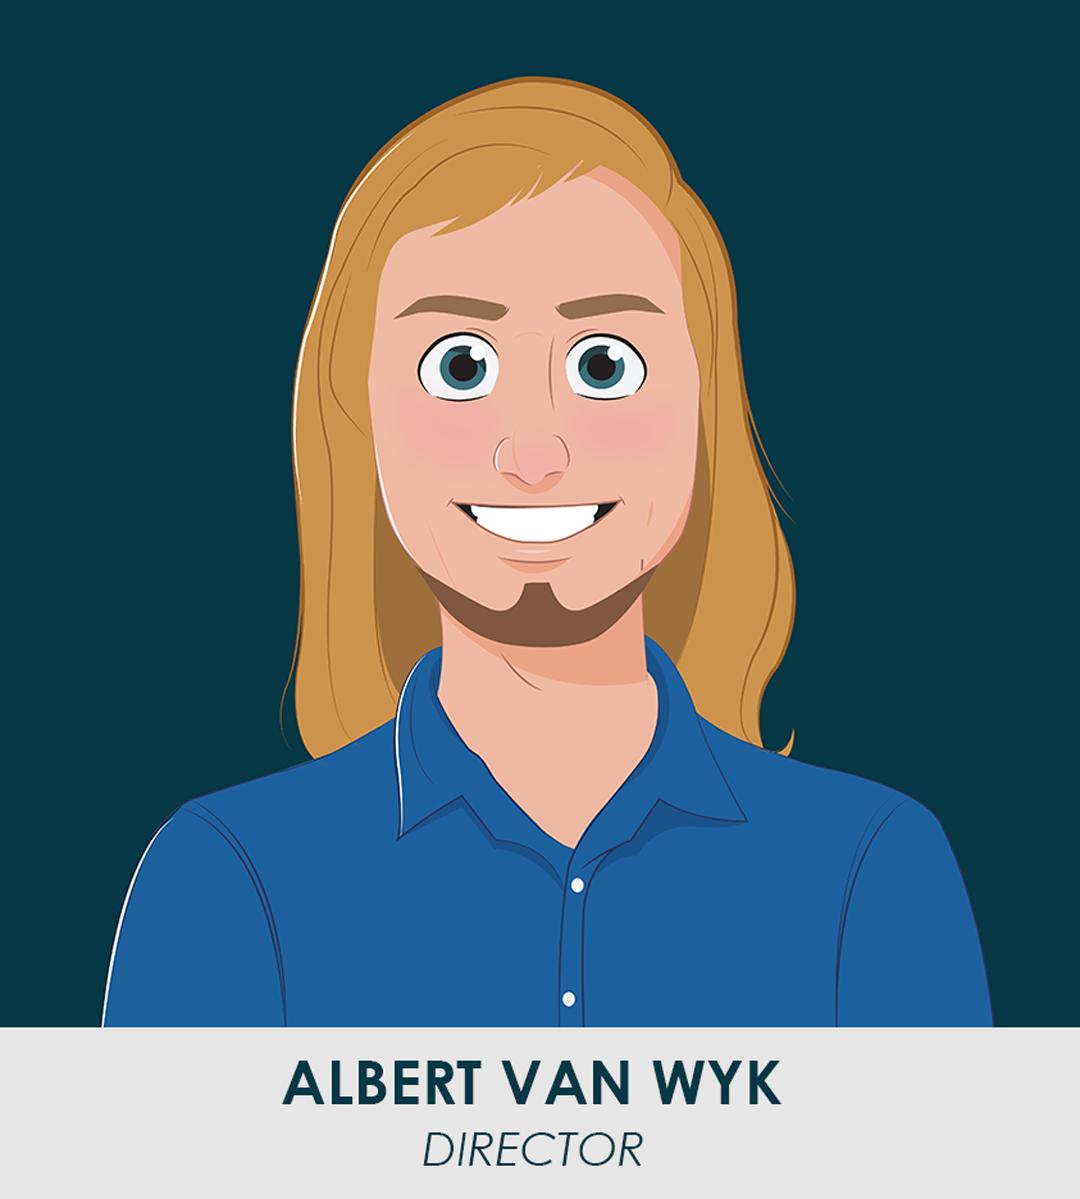 Image of Albert